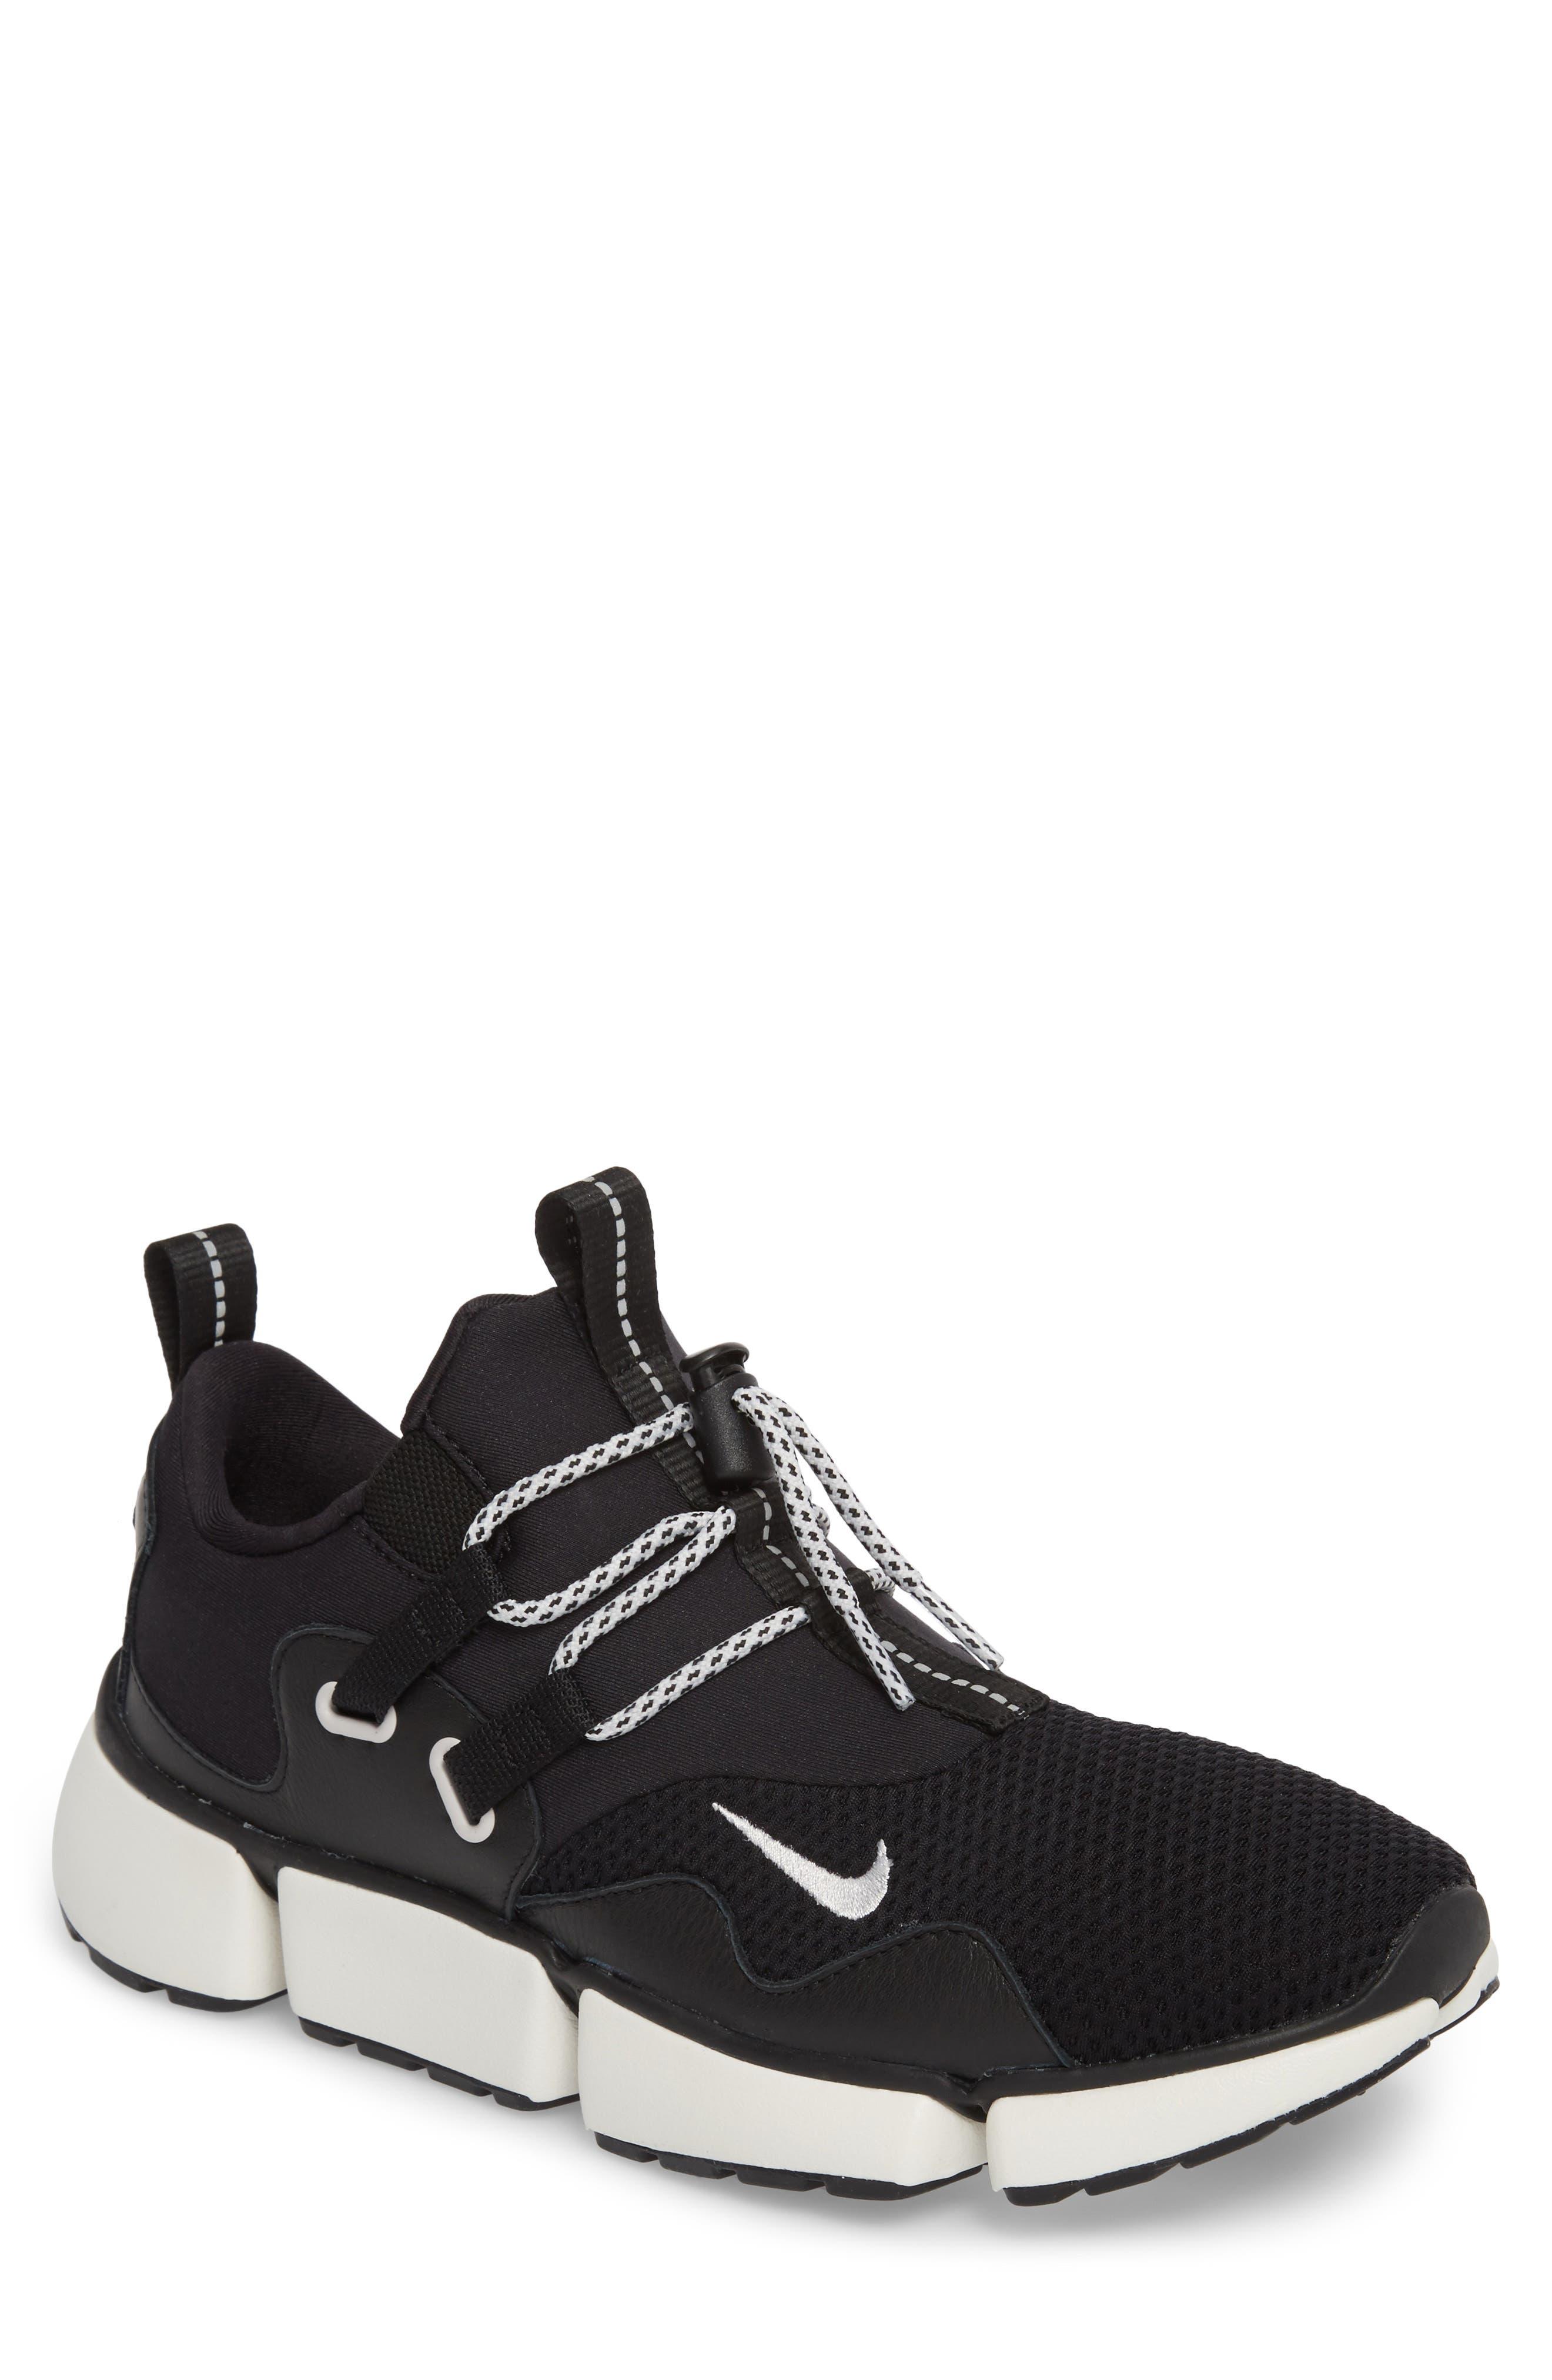 Pocket Knife DM Sneaker,                             Main thumbnail 1, color,                             Black/ Vast Grey/ Sail